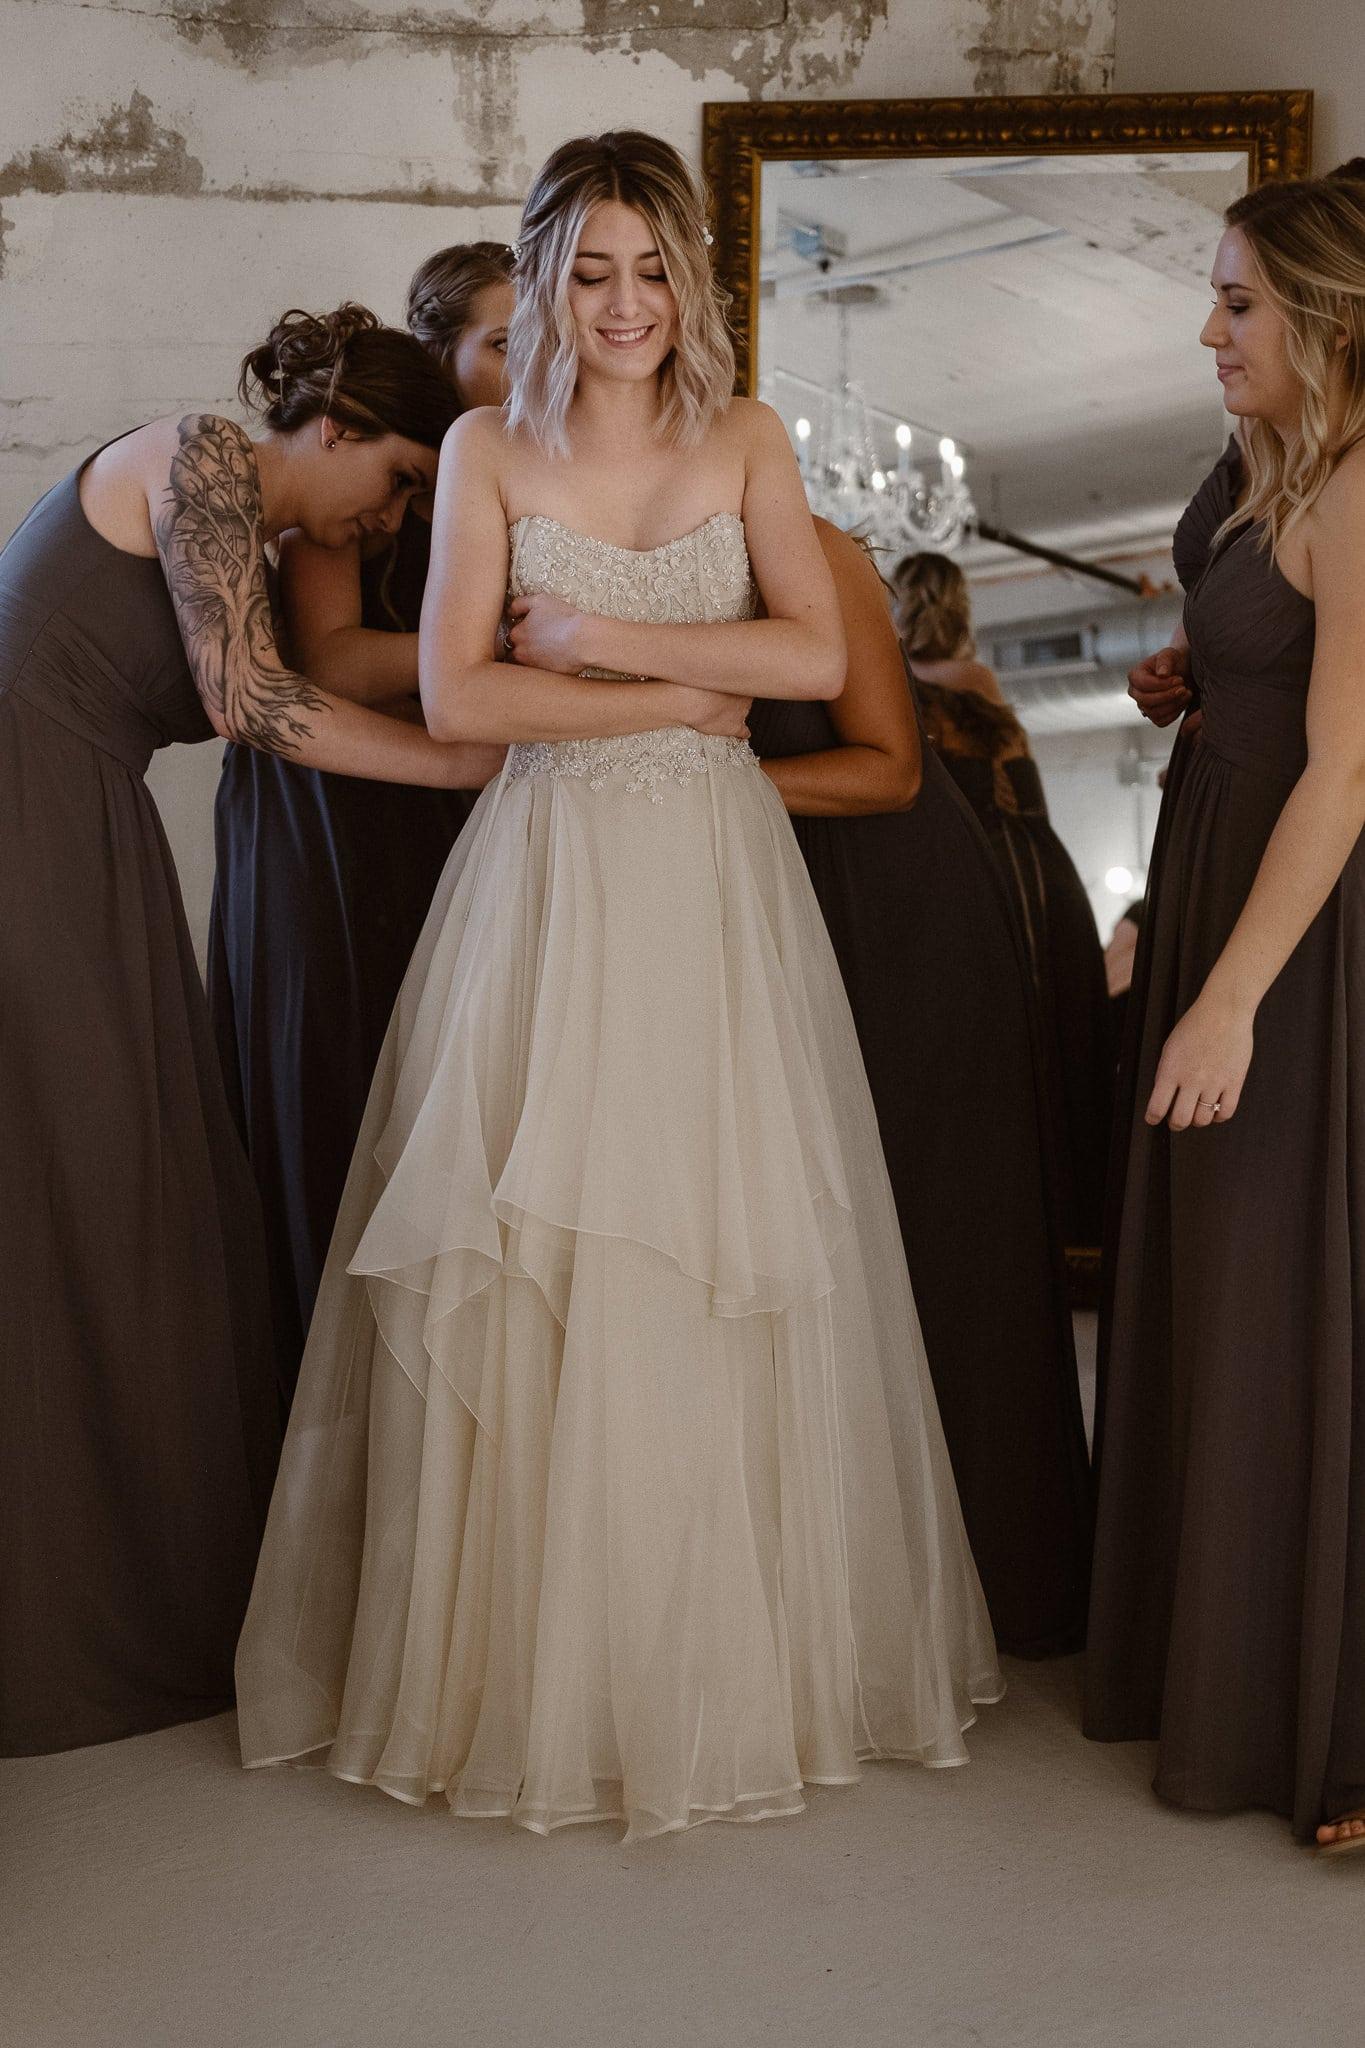 St Vrain Wedding Photographer   Longmont Wedding Photographer   Colorado Winter Wedding Photographer, Colorado industrial chic wedding, bride getting ready